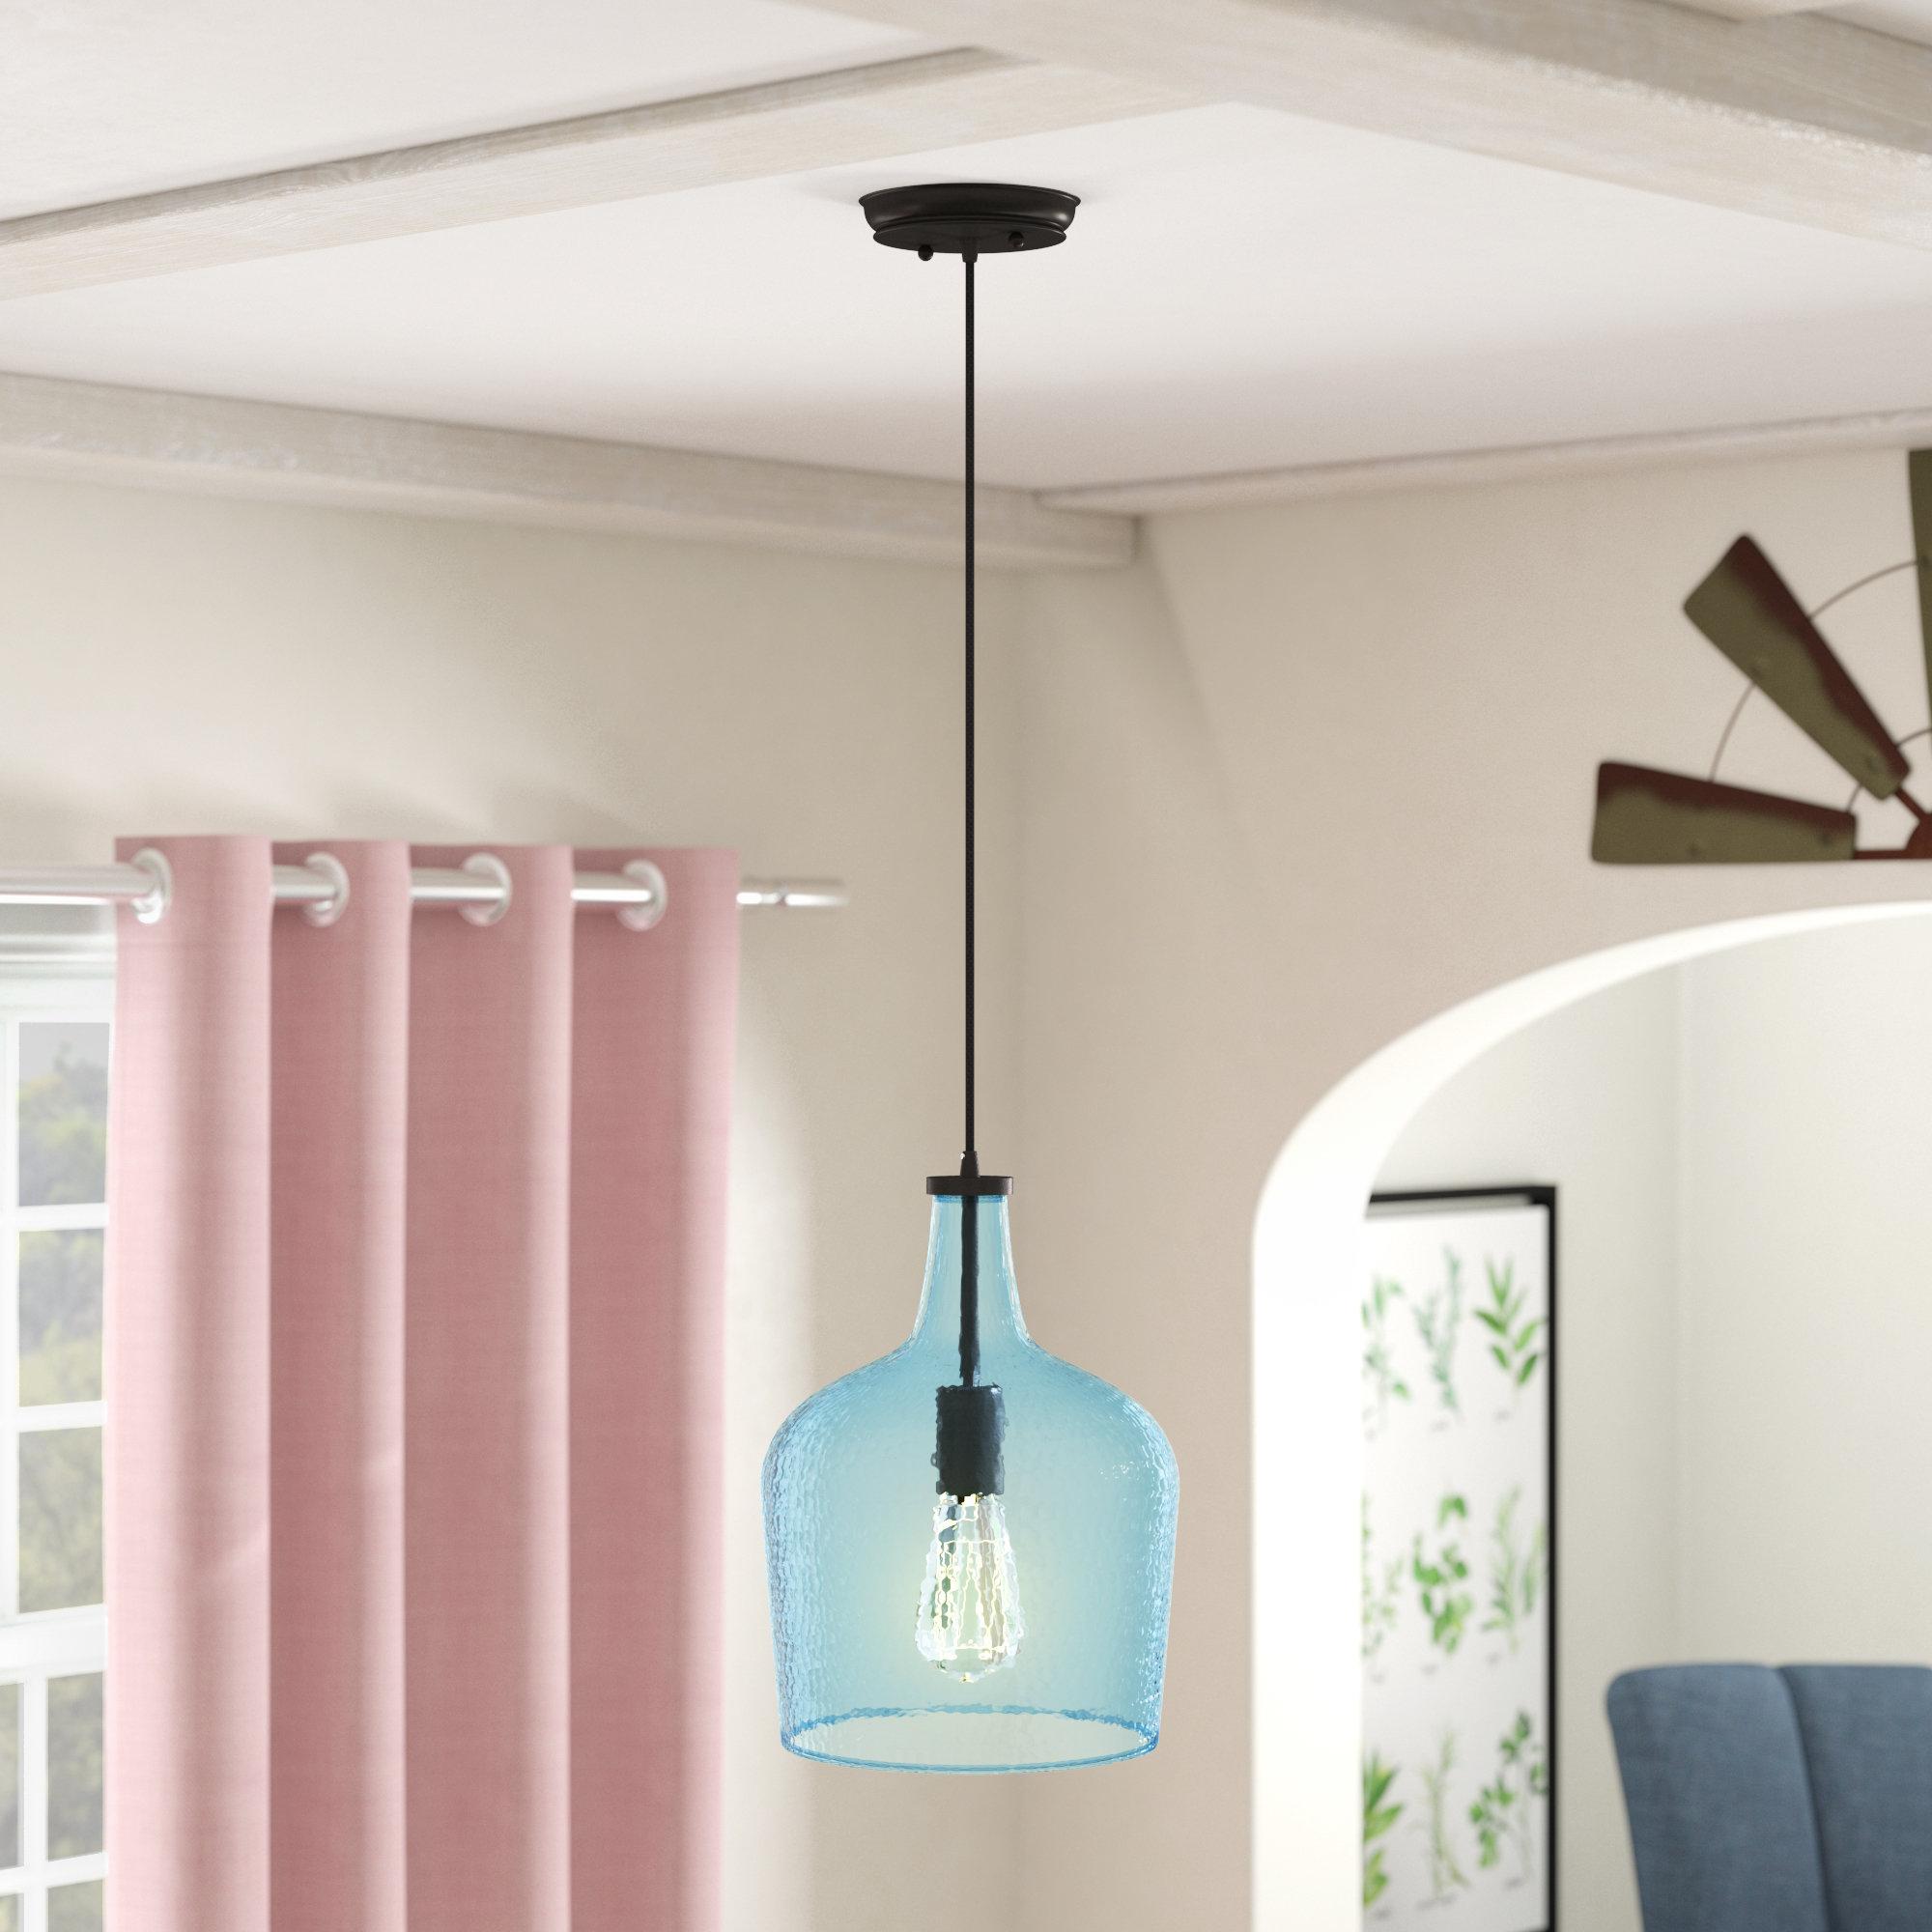 Most Popular 1 Light Single Bell Pendants Inside Scruggs 1 Light Single Bell Pendant (View 13 of 20)